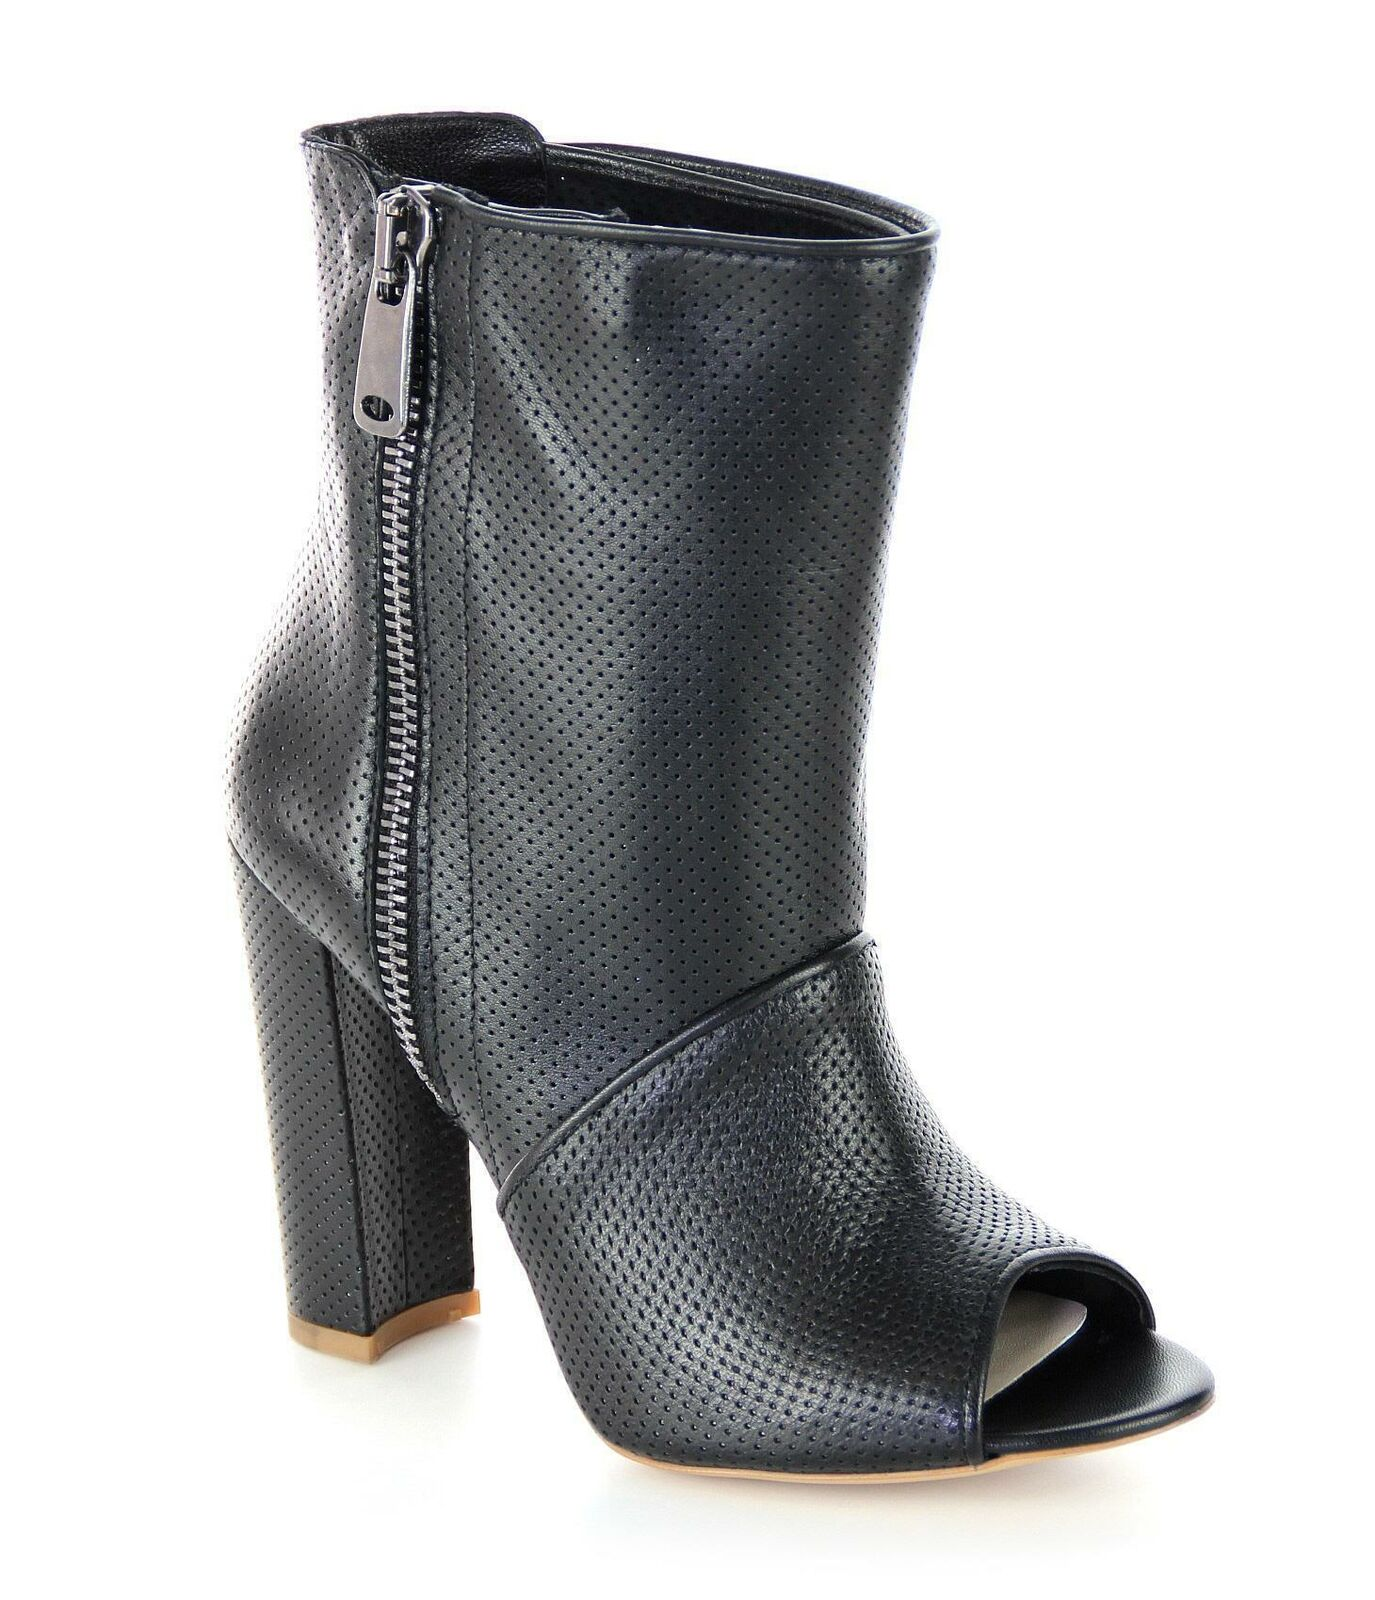 FersenGold - Istanbul Stiefelette Damen Schuhe schwarz Designer Neu